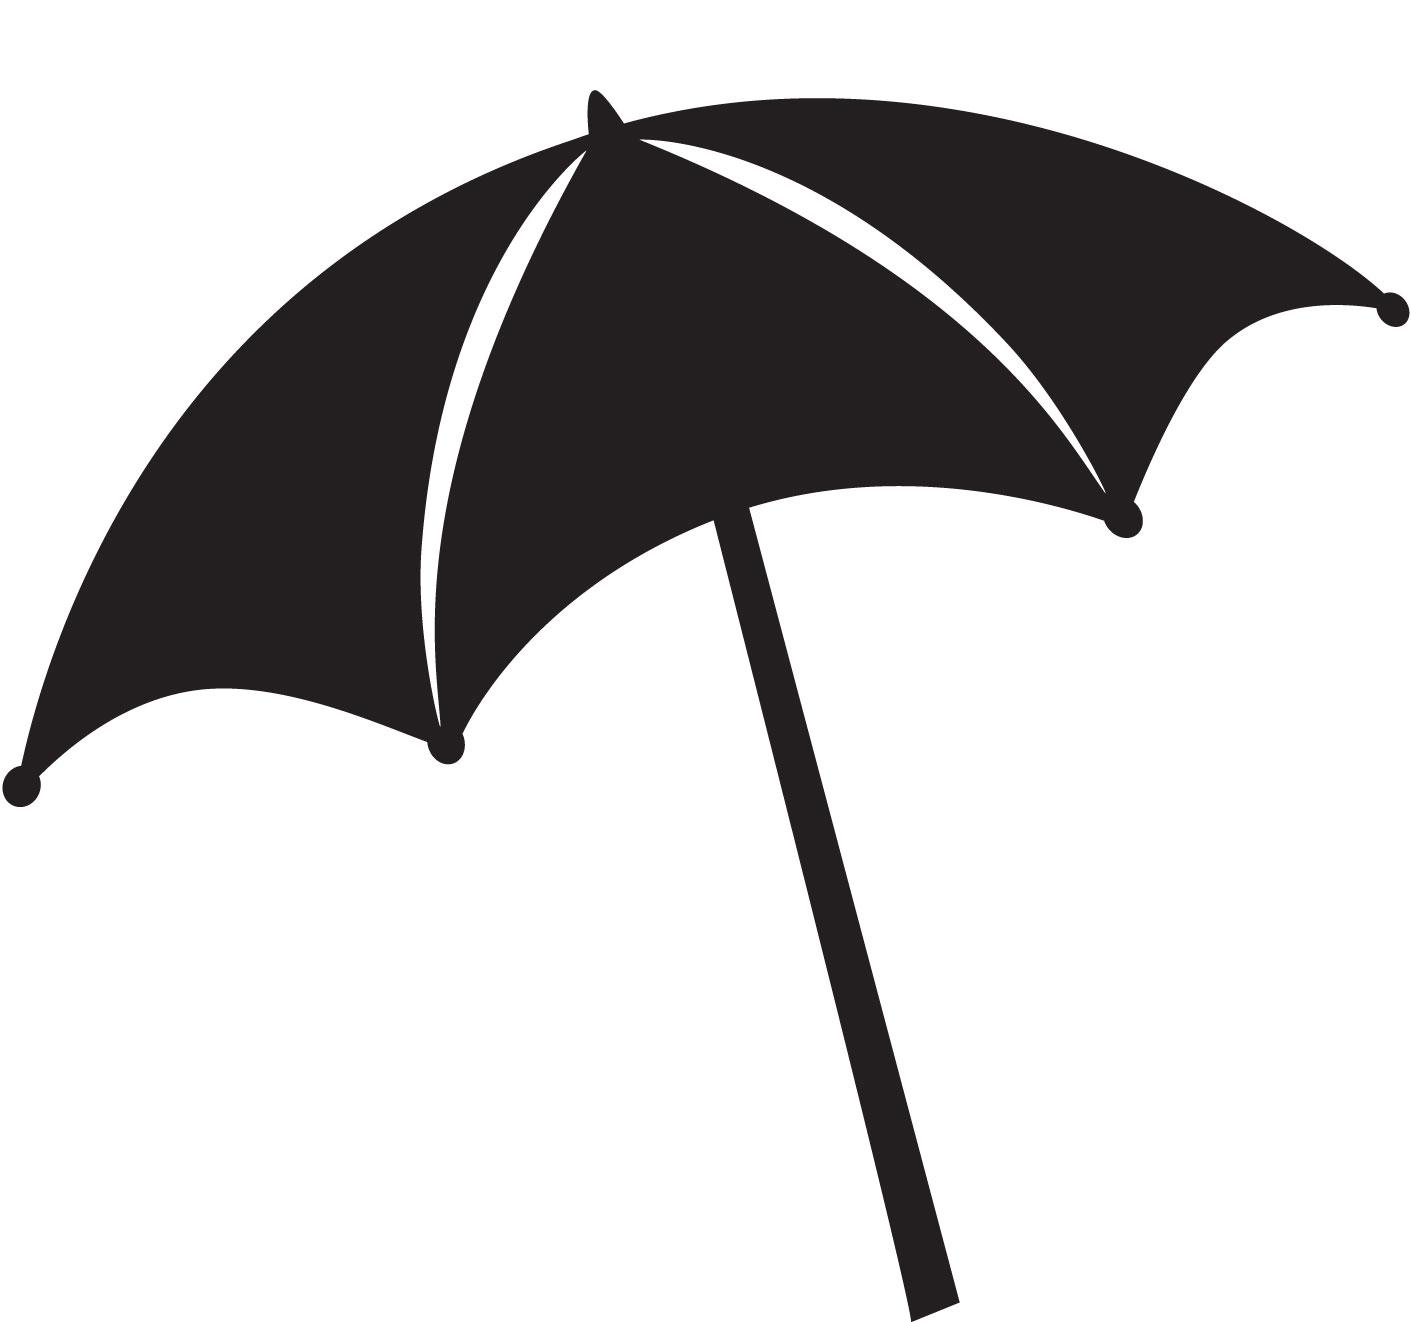 Umbrella Outline | Free download on ClipArtMag